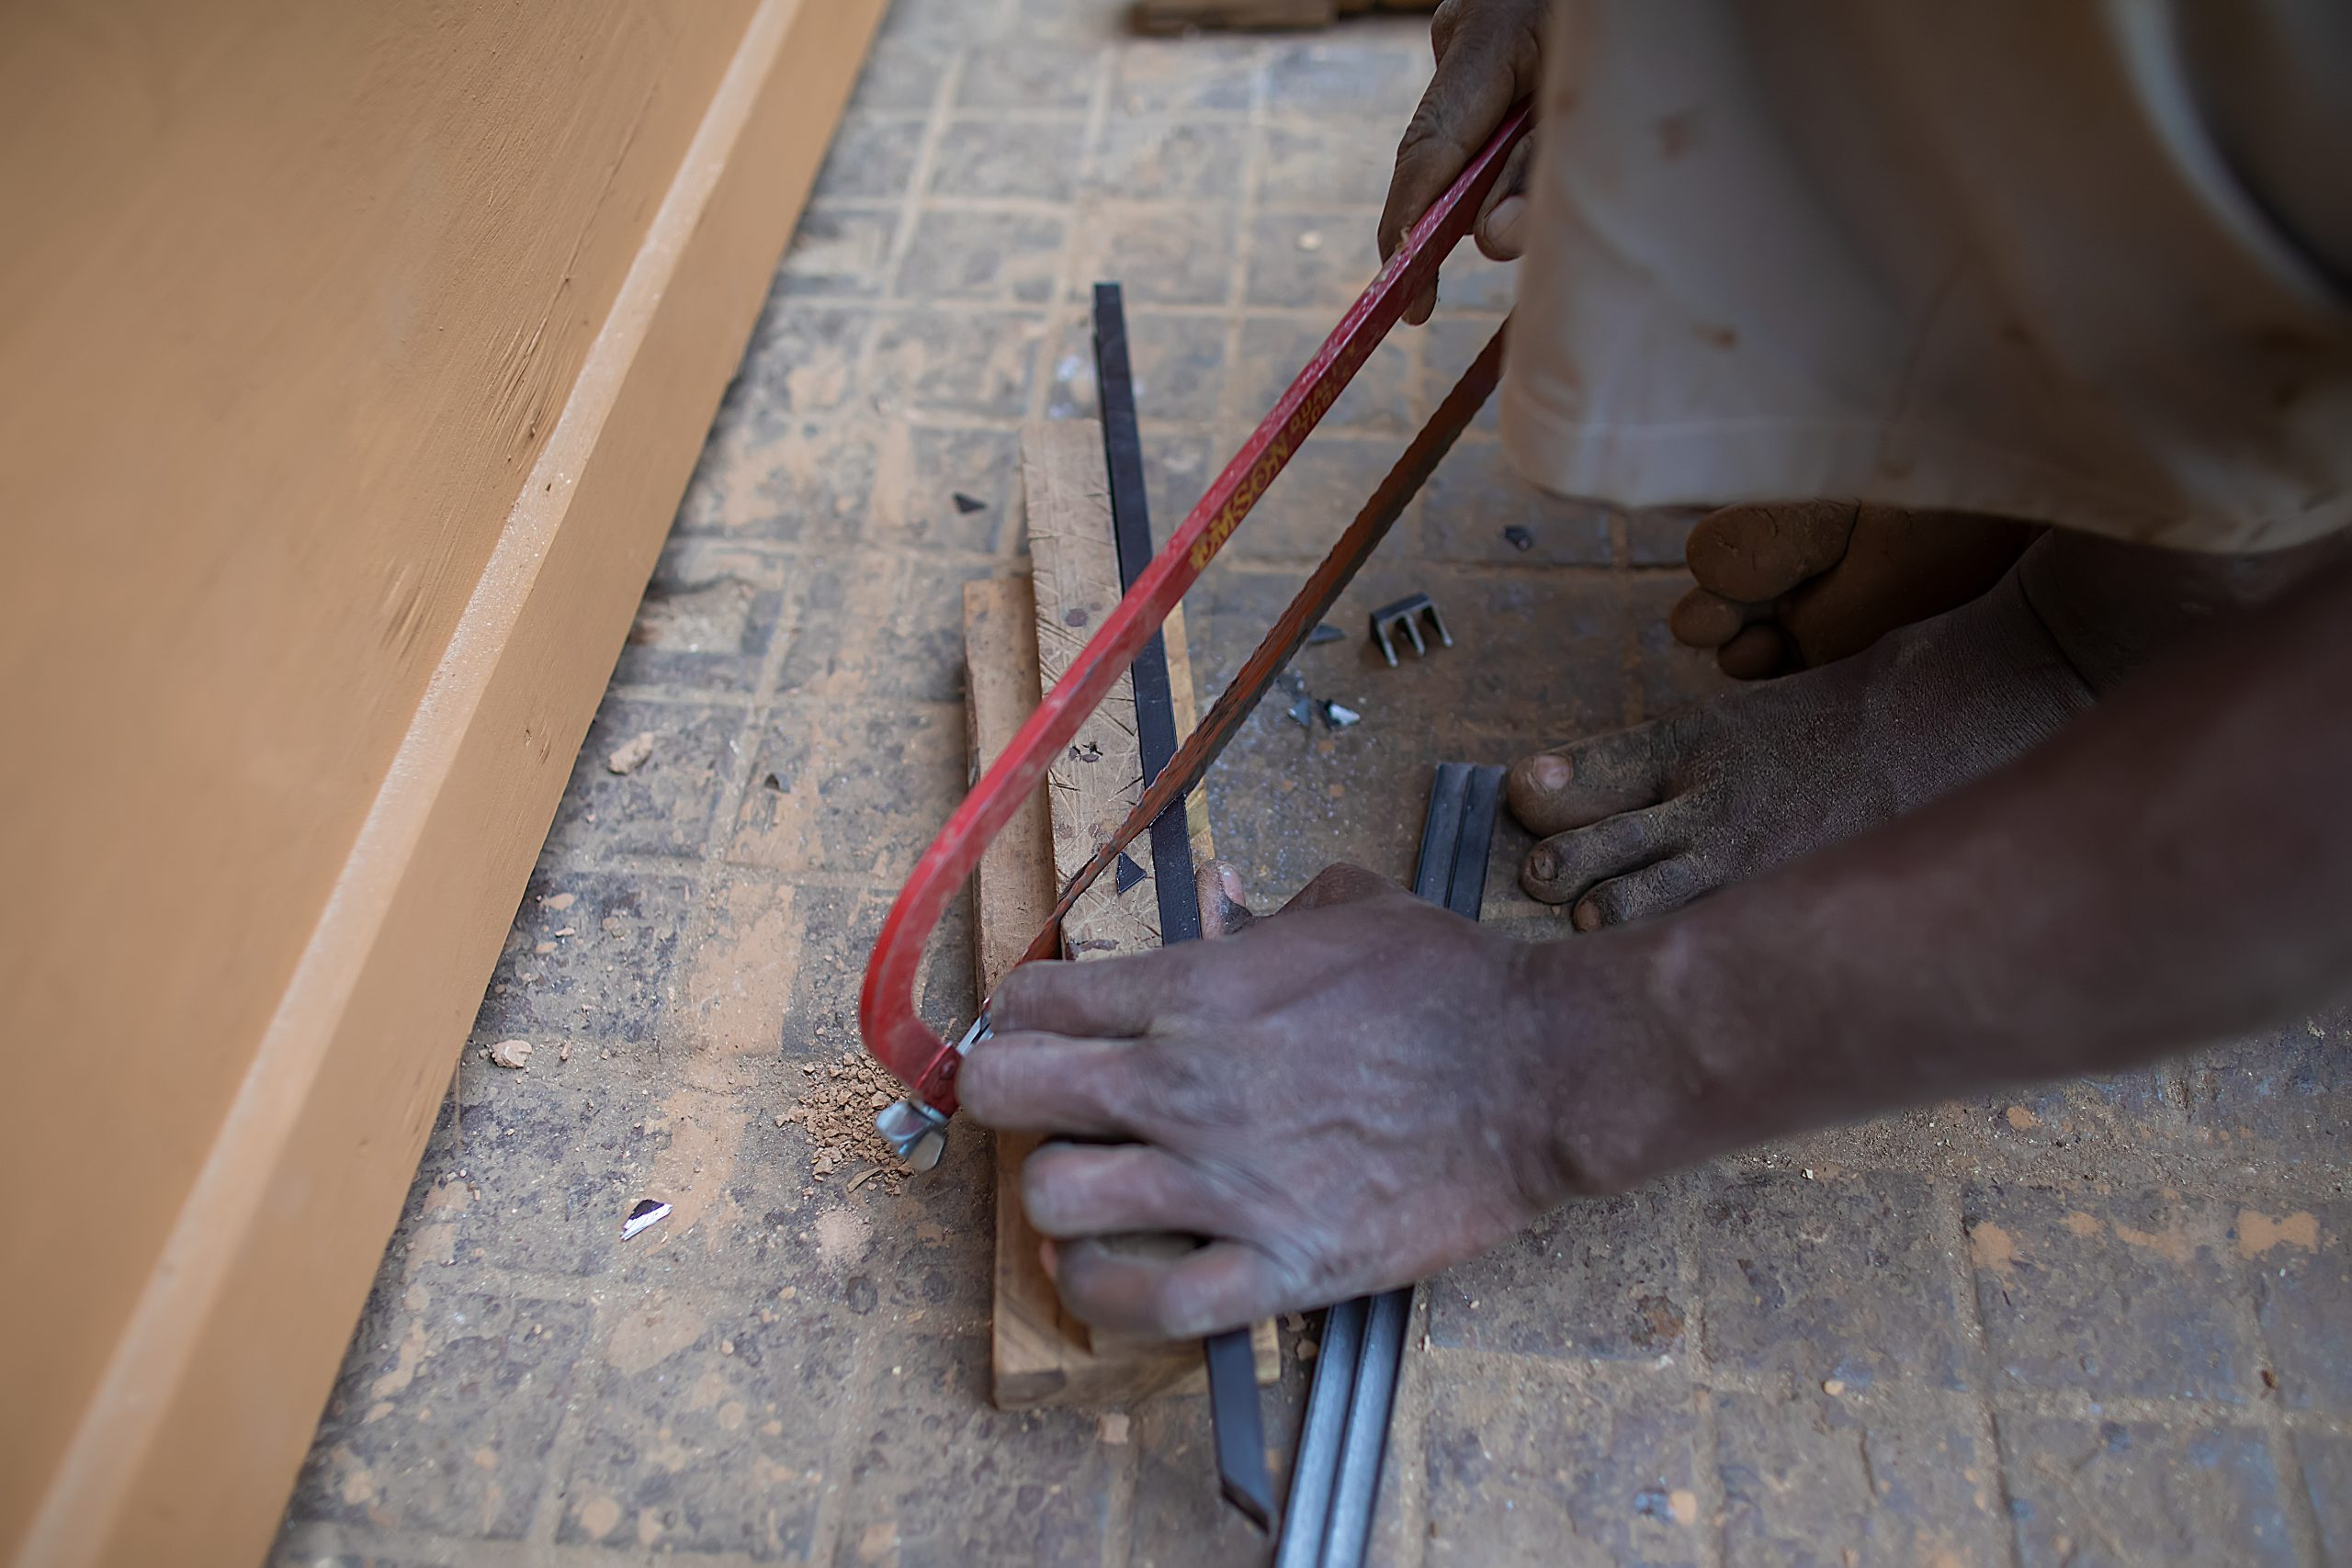 A carpenter cutting with hacksaw